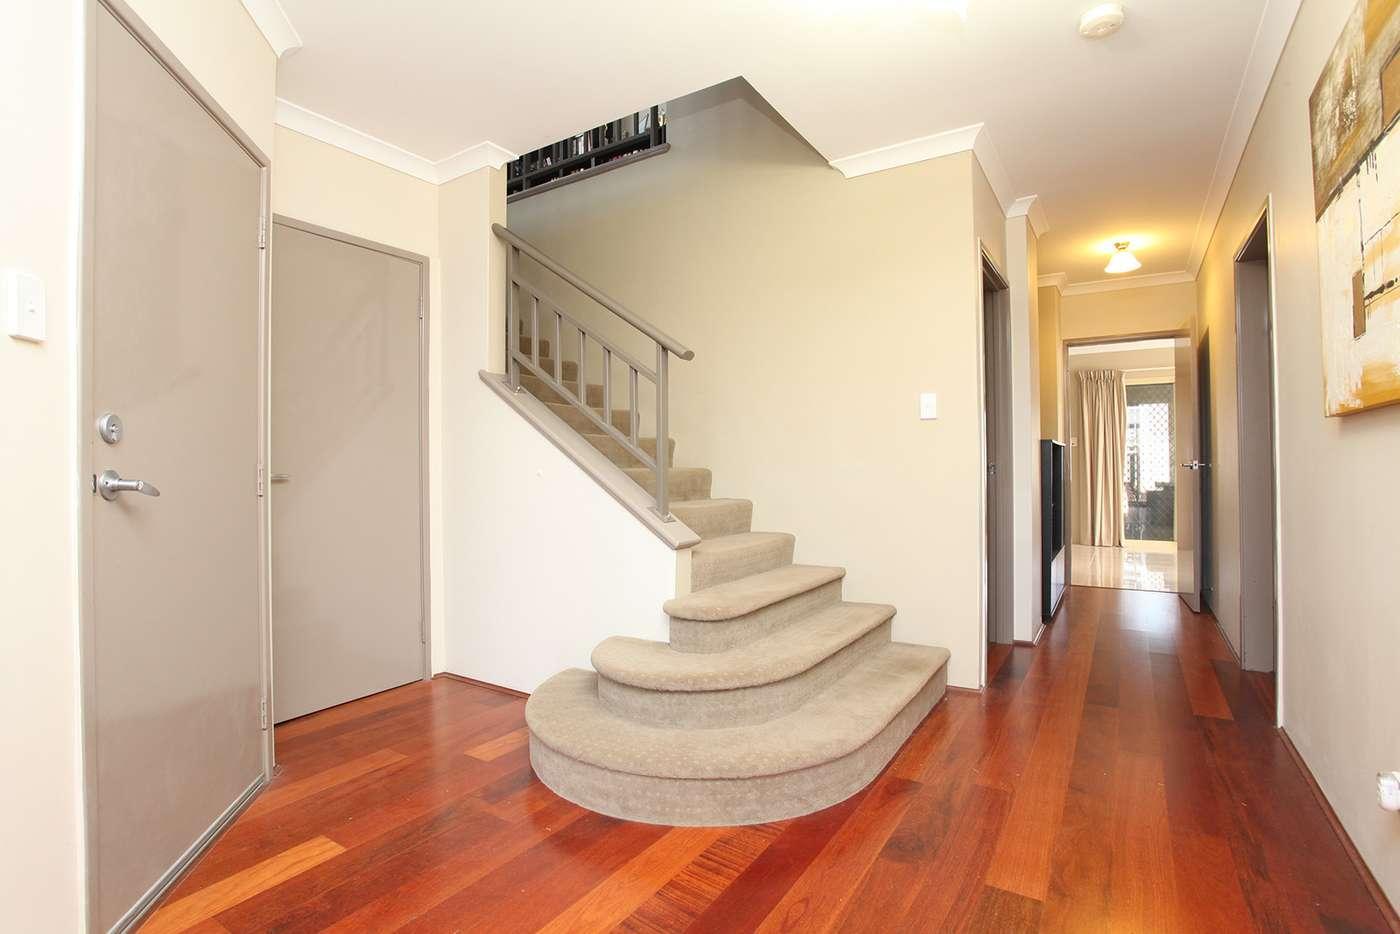 Fifth view of Homely house listing, 16 Burdekin Vista, Hammond Park WA 6164